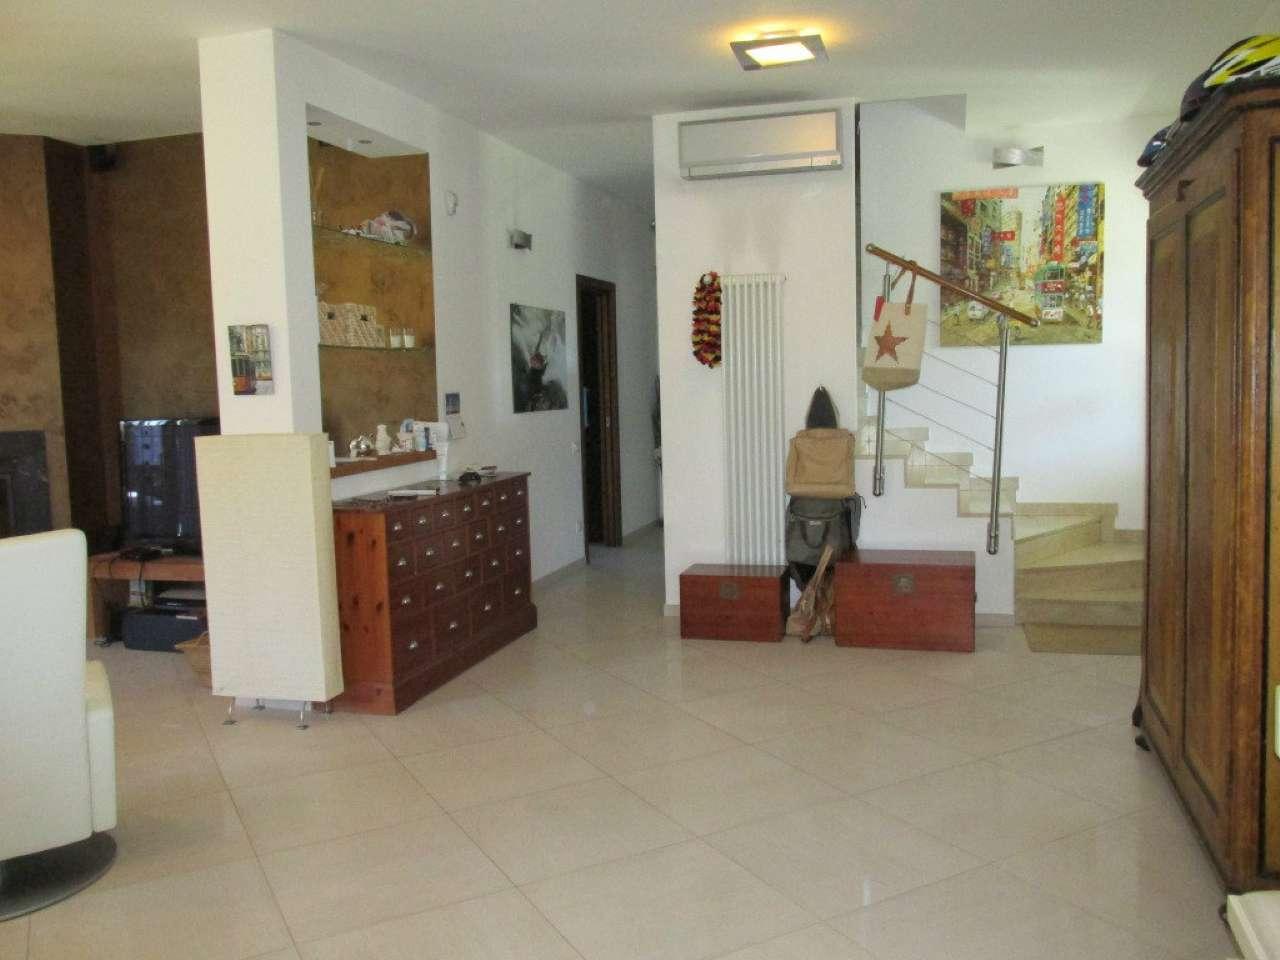 Villa in Vendita a Segrate: 5 locali, 300 mq - Foto 3